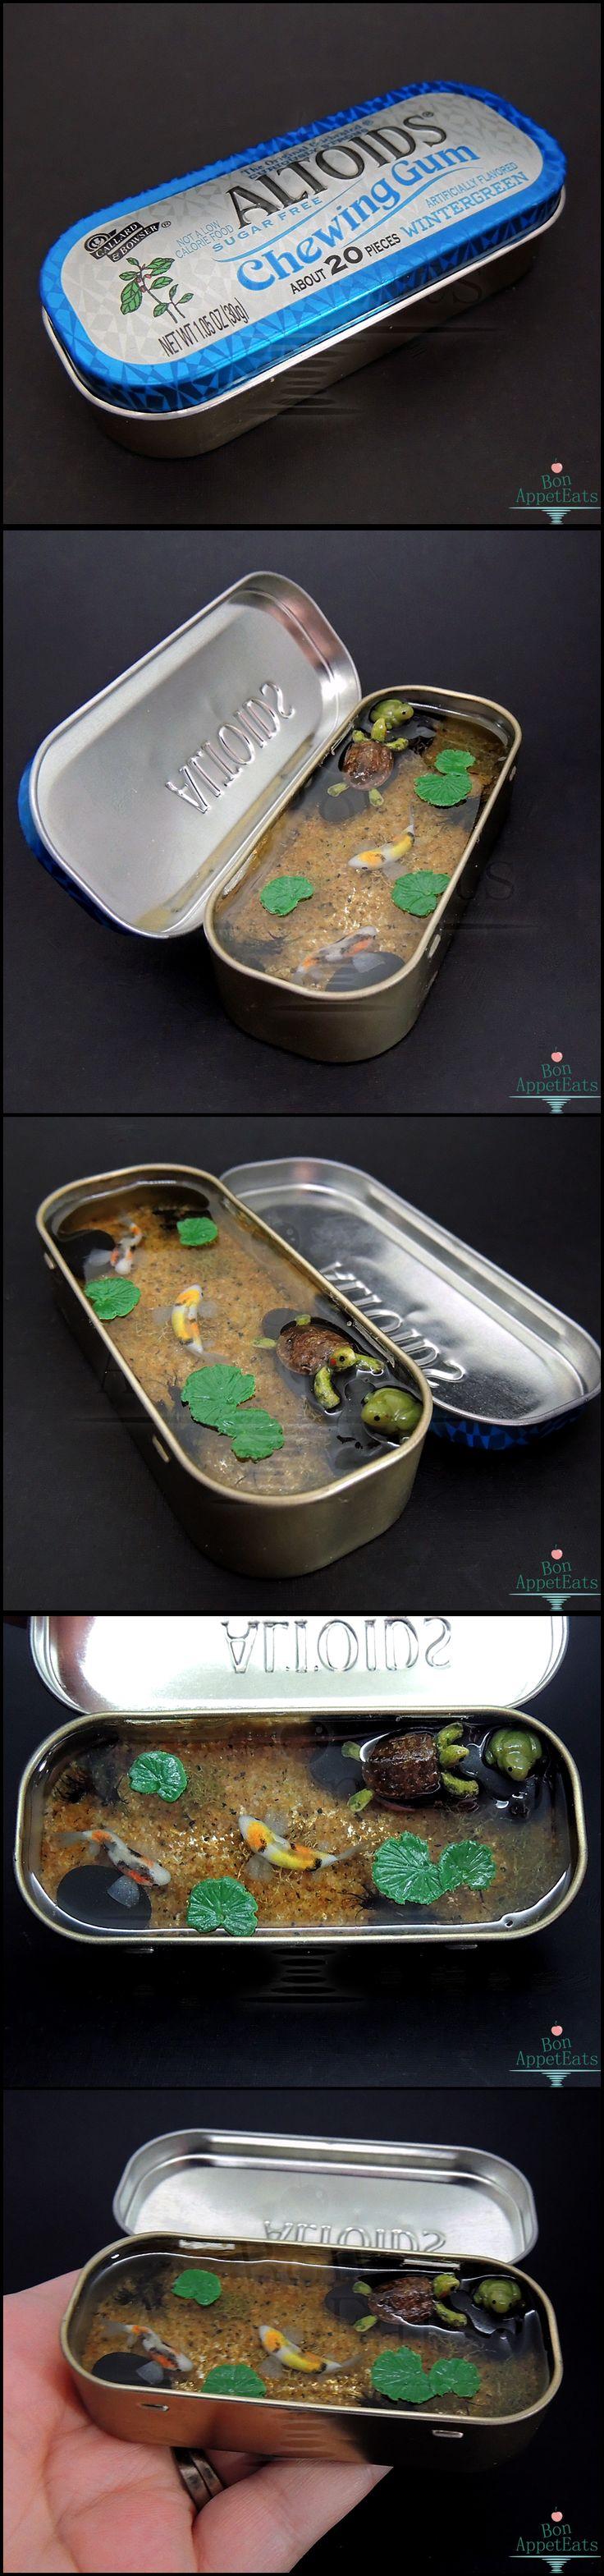 Commission: Tin Pond with Koi, Turtle, and Frog by Bon-AppetEats.deviantart.com on @deviantART